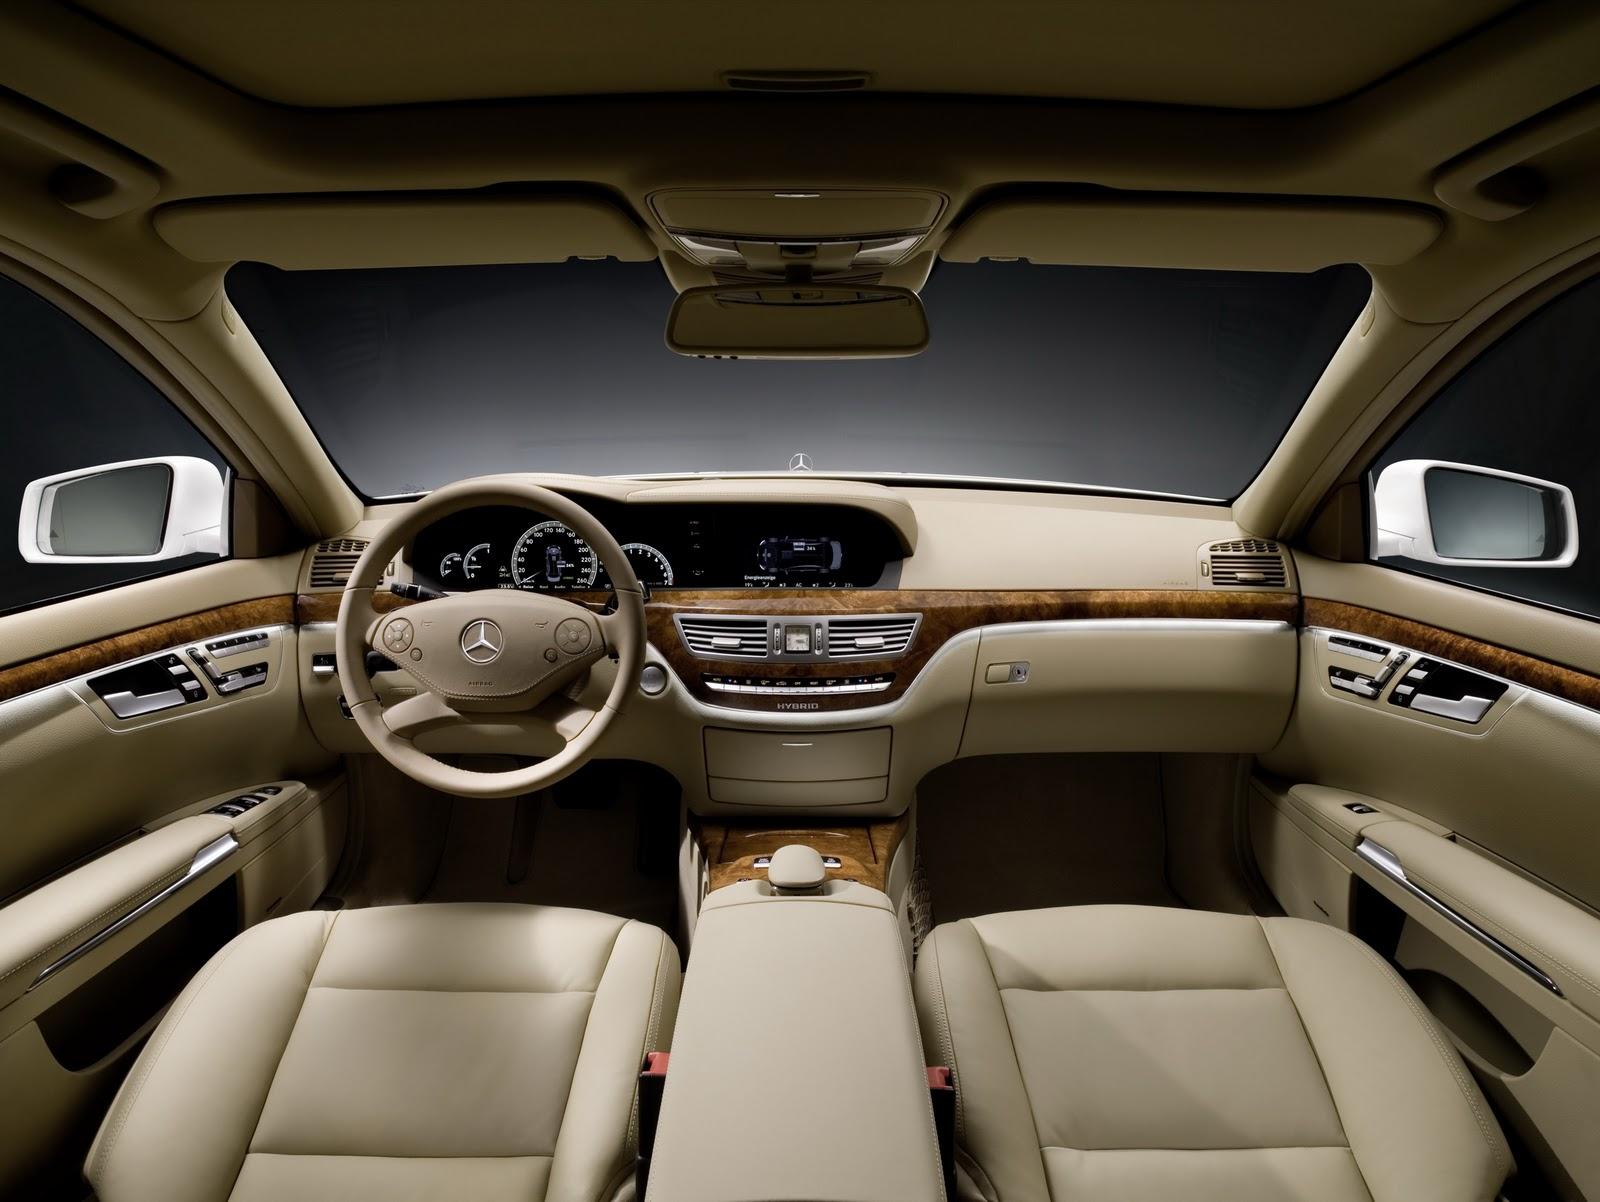 Mercedes S Class Interior Lighting O Cars Life Cars Fashion Lifestyle Blog